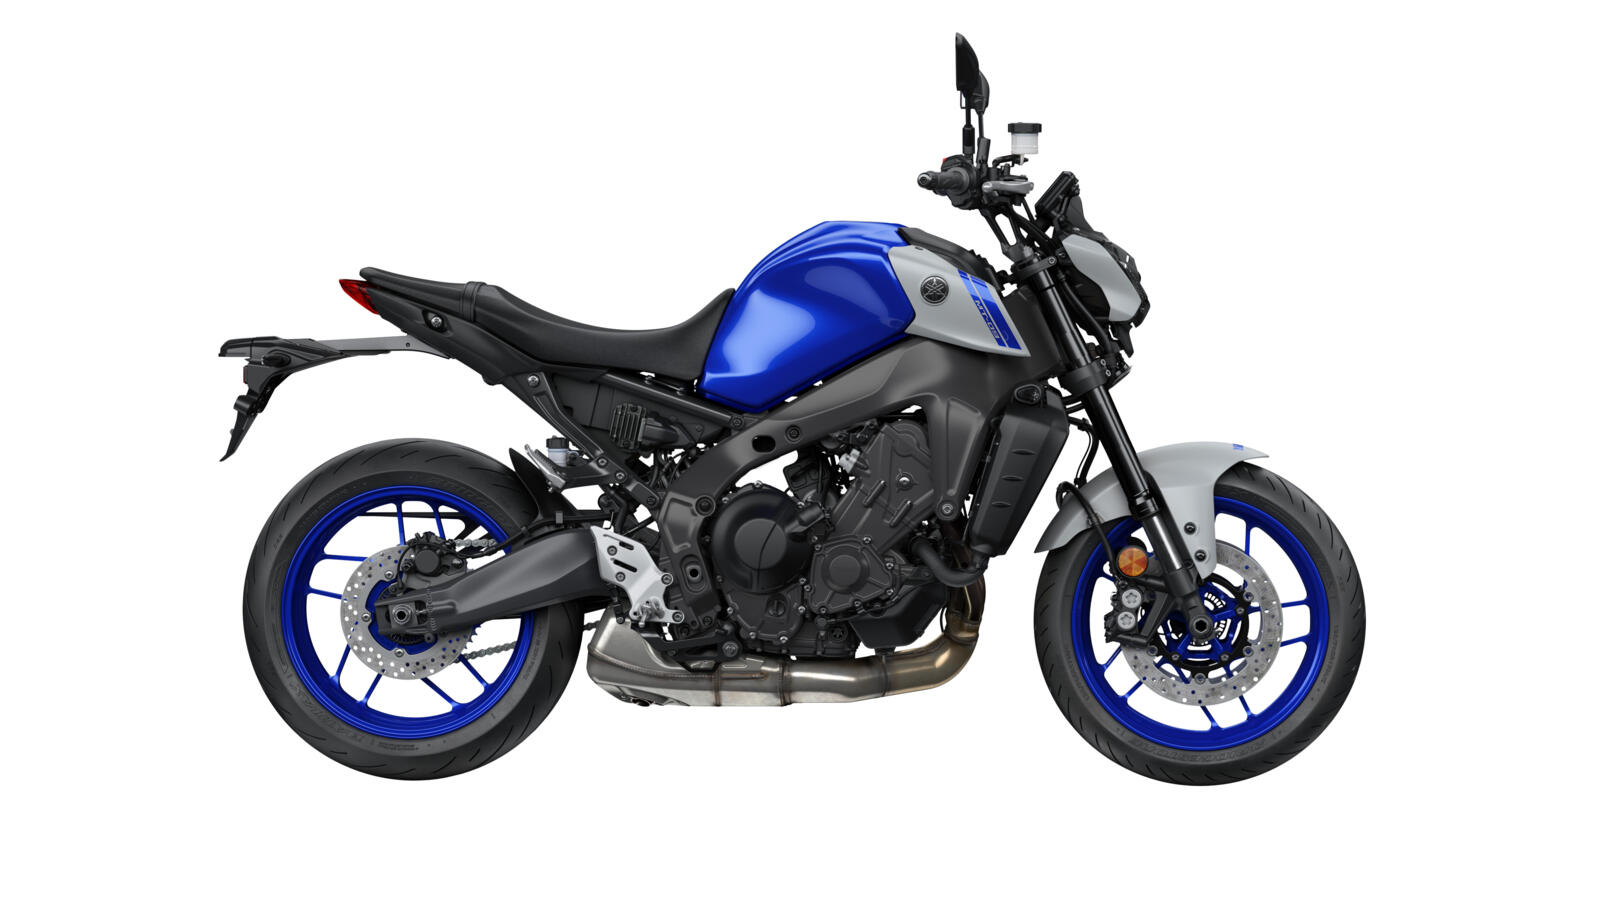 Yamaha MT-09 nu kopen